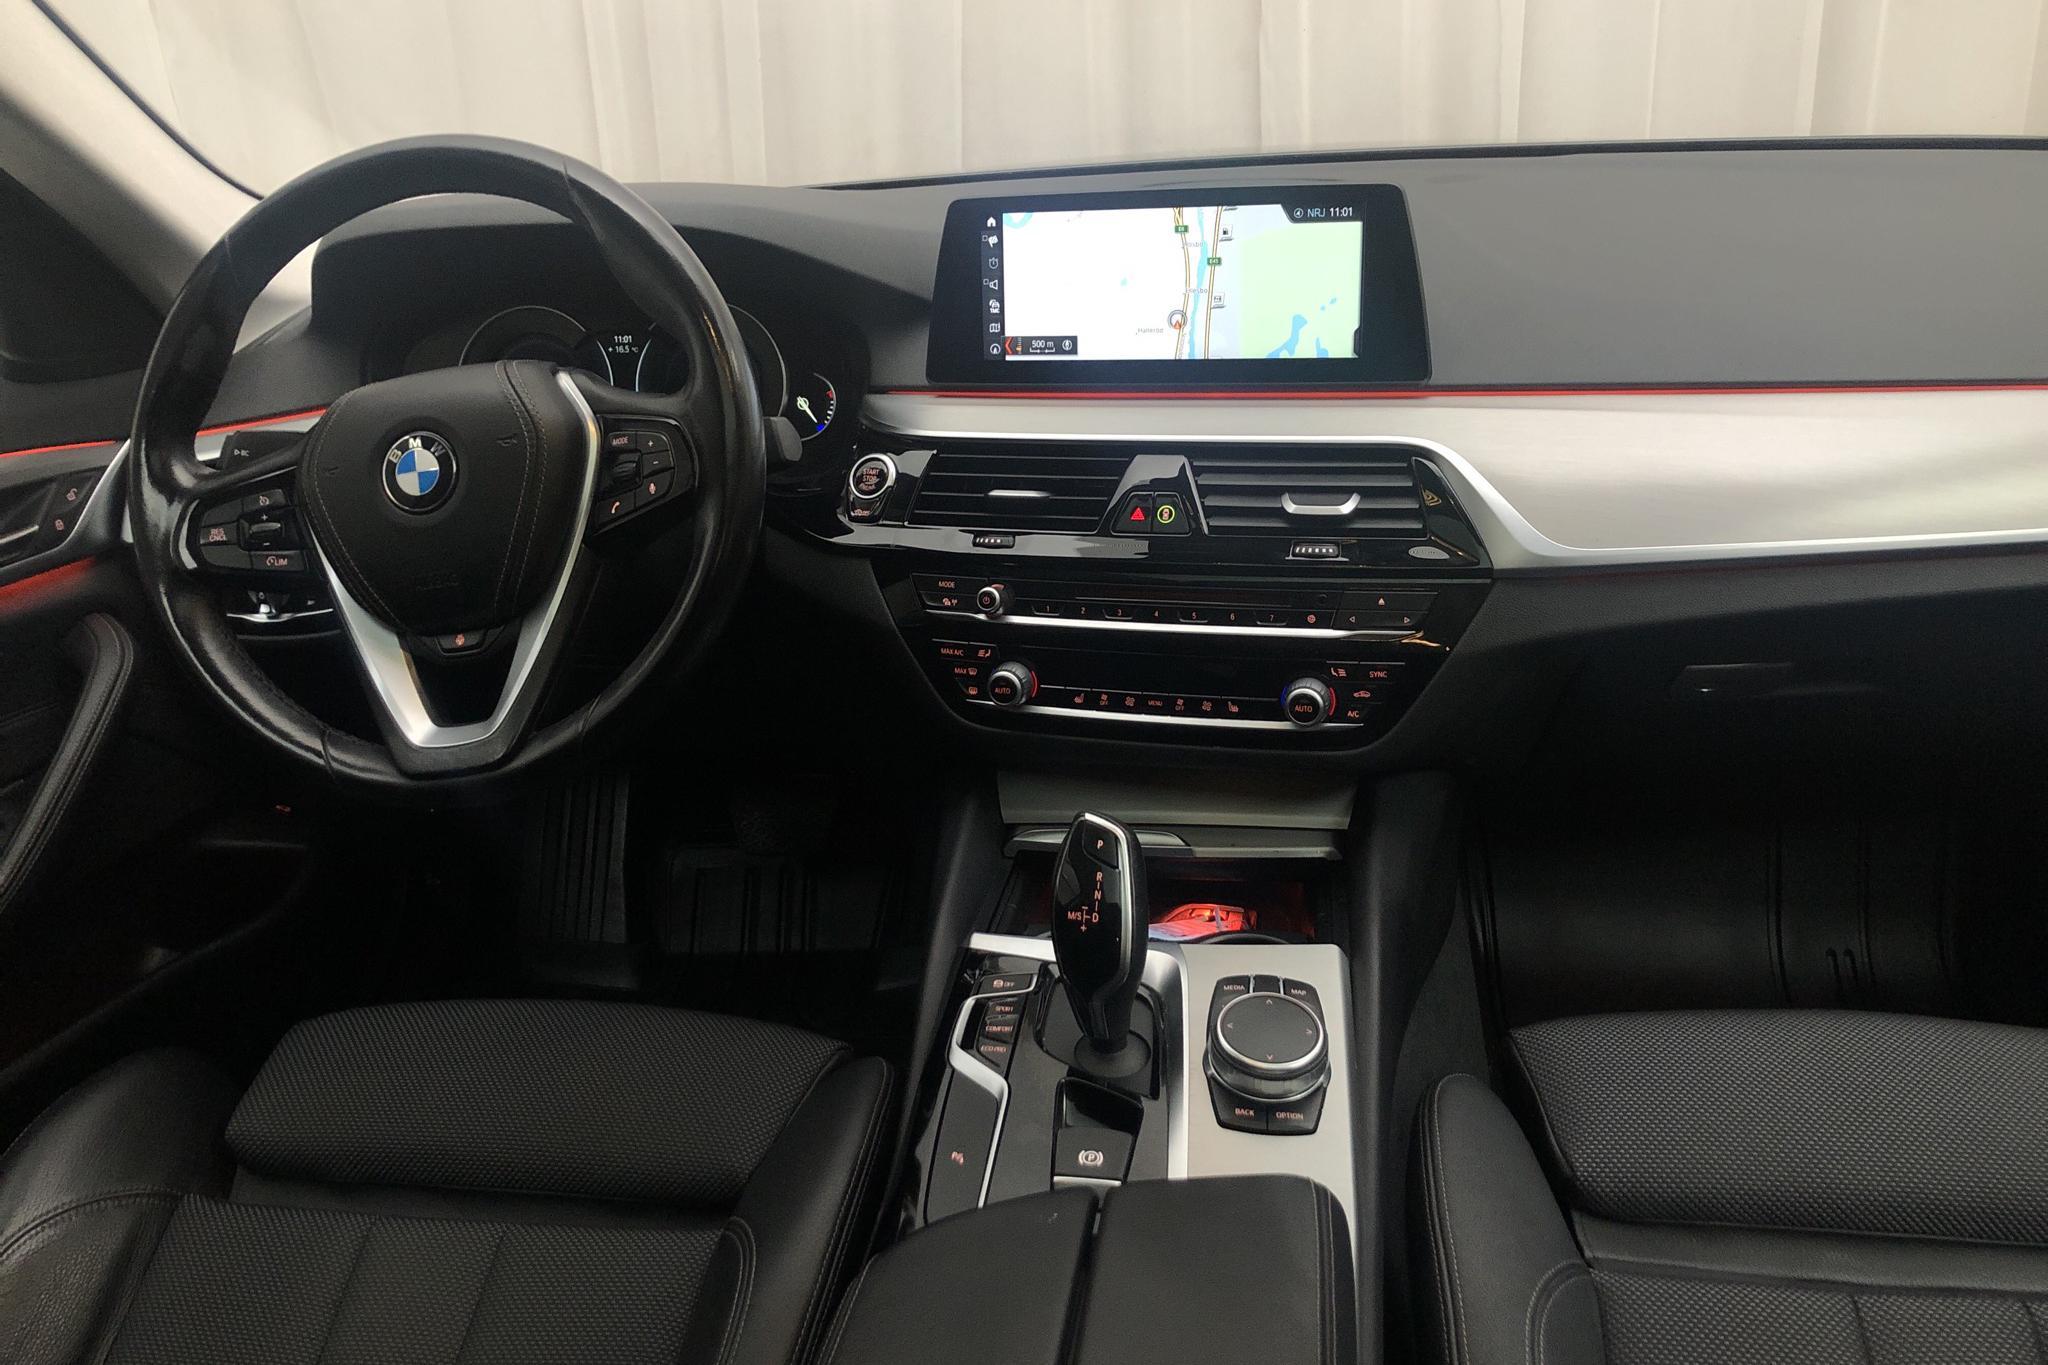 BMW 520d Sedan, G30 (190hk) - 9 724 mil - Automat - svart - 2018